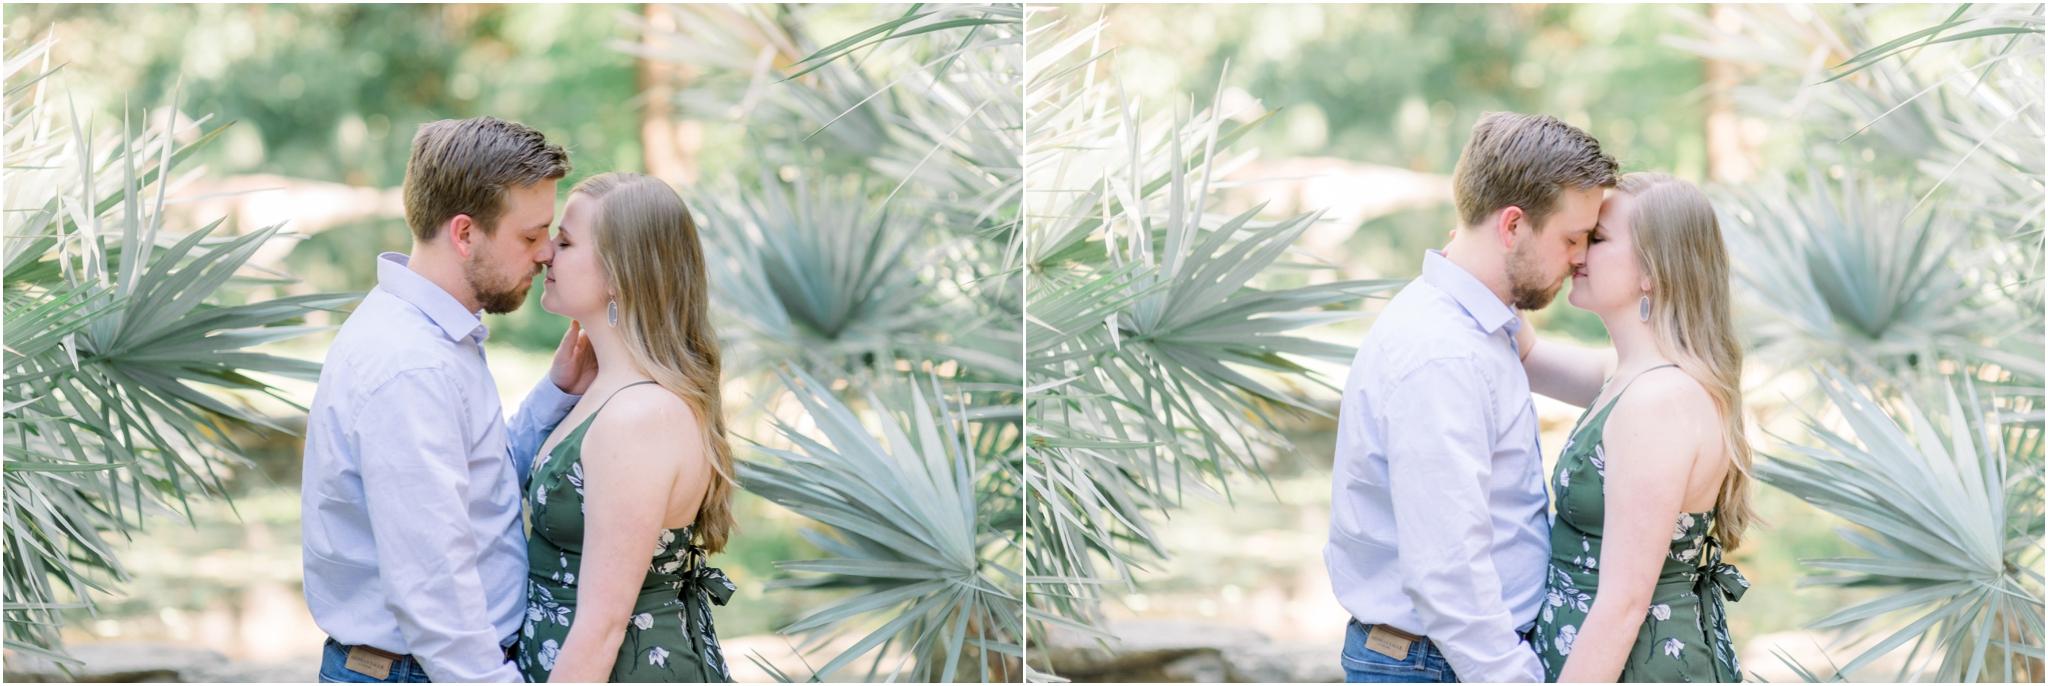 Allison&Colton_0003.jpg